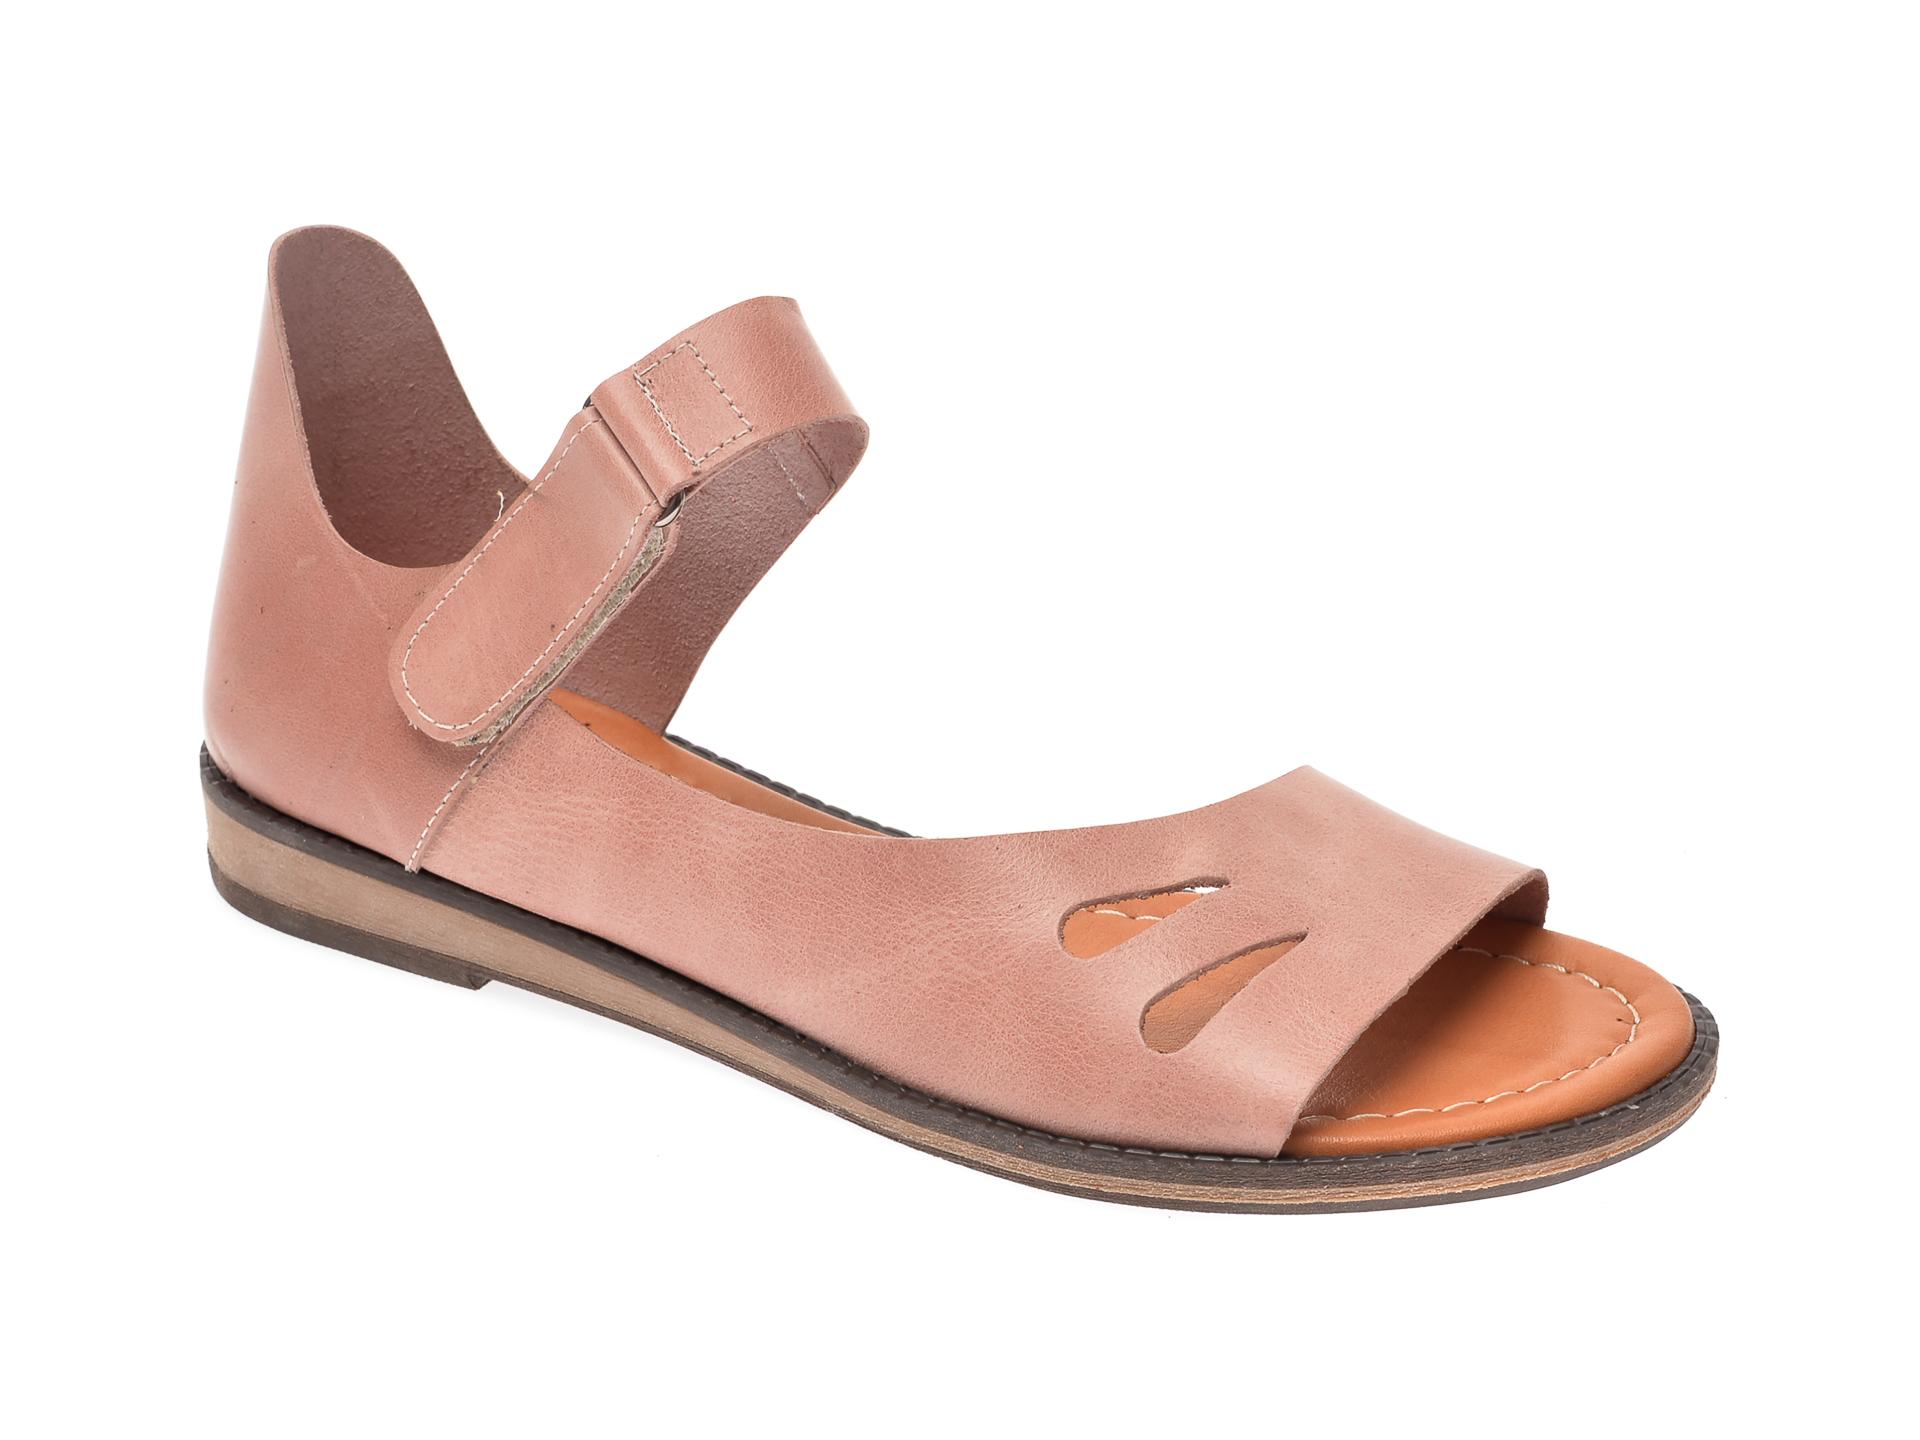 Sandale IMAGE roz, 118, din piele naturala